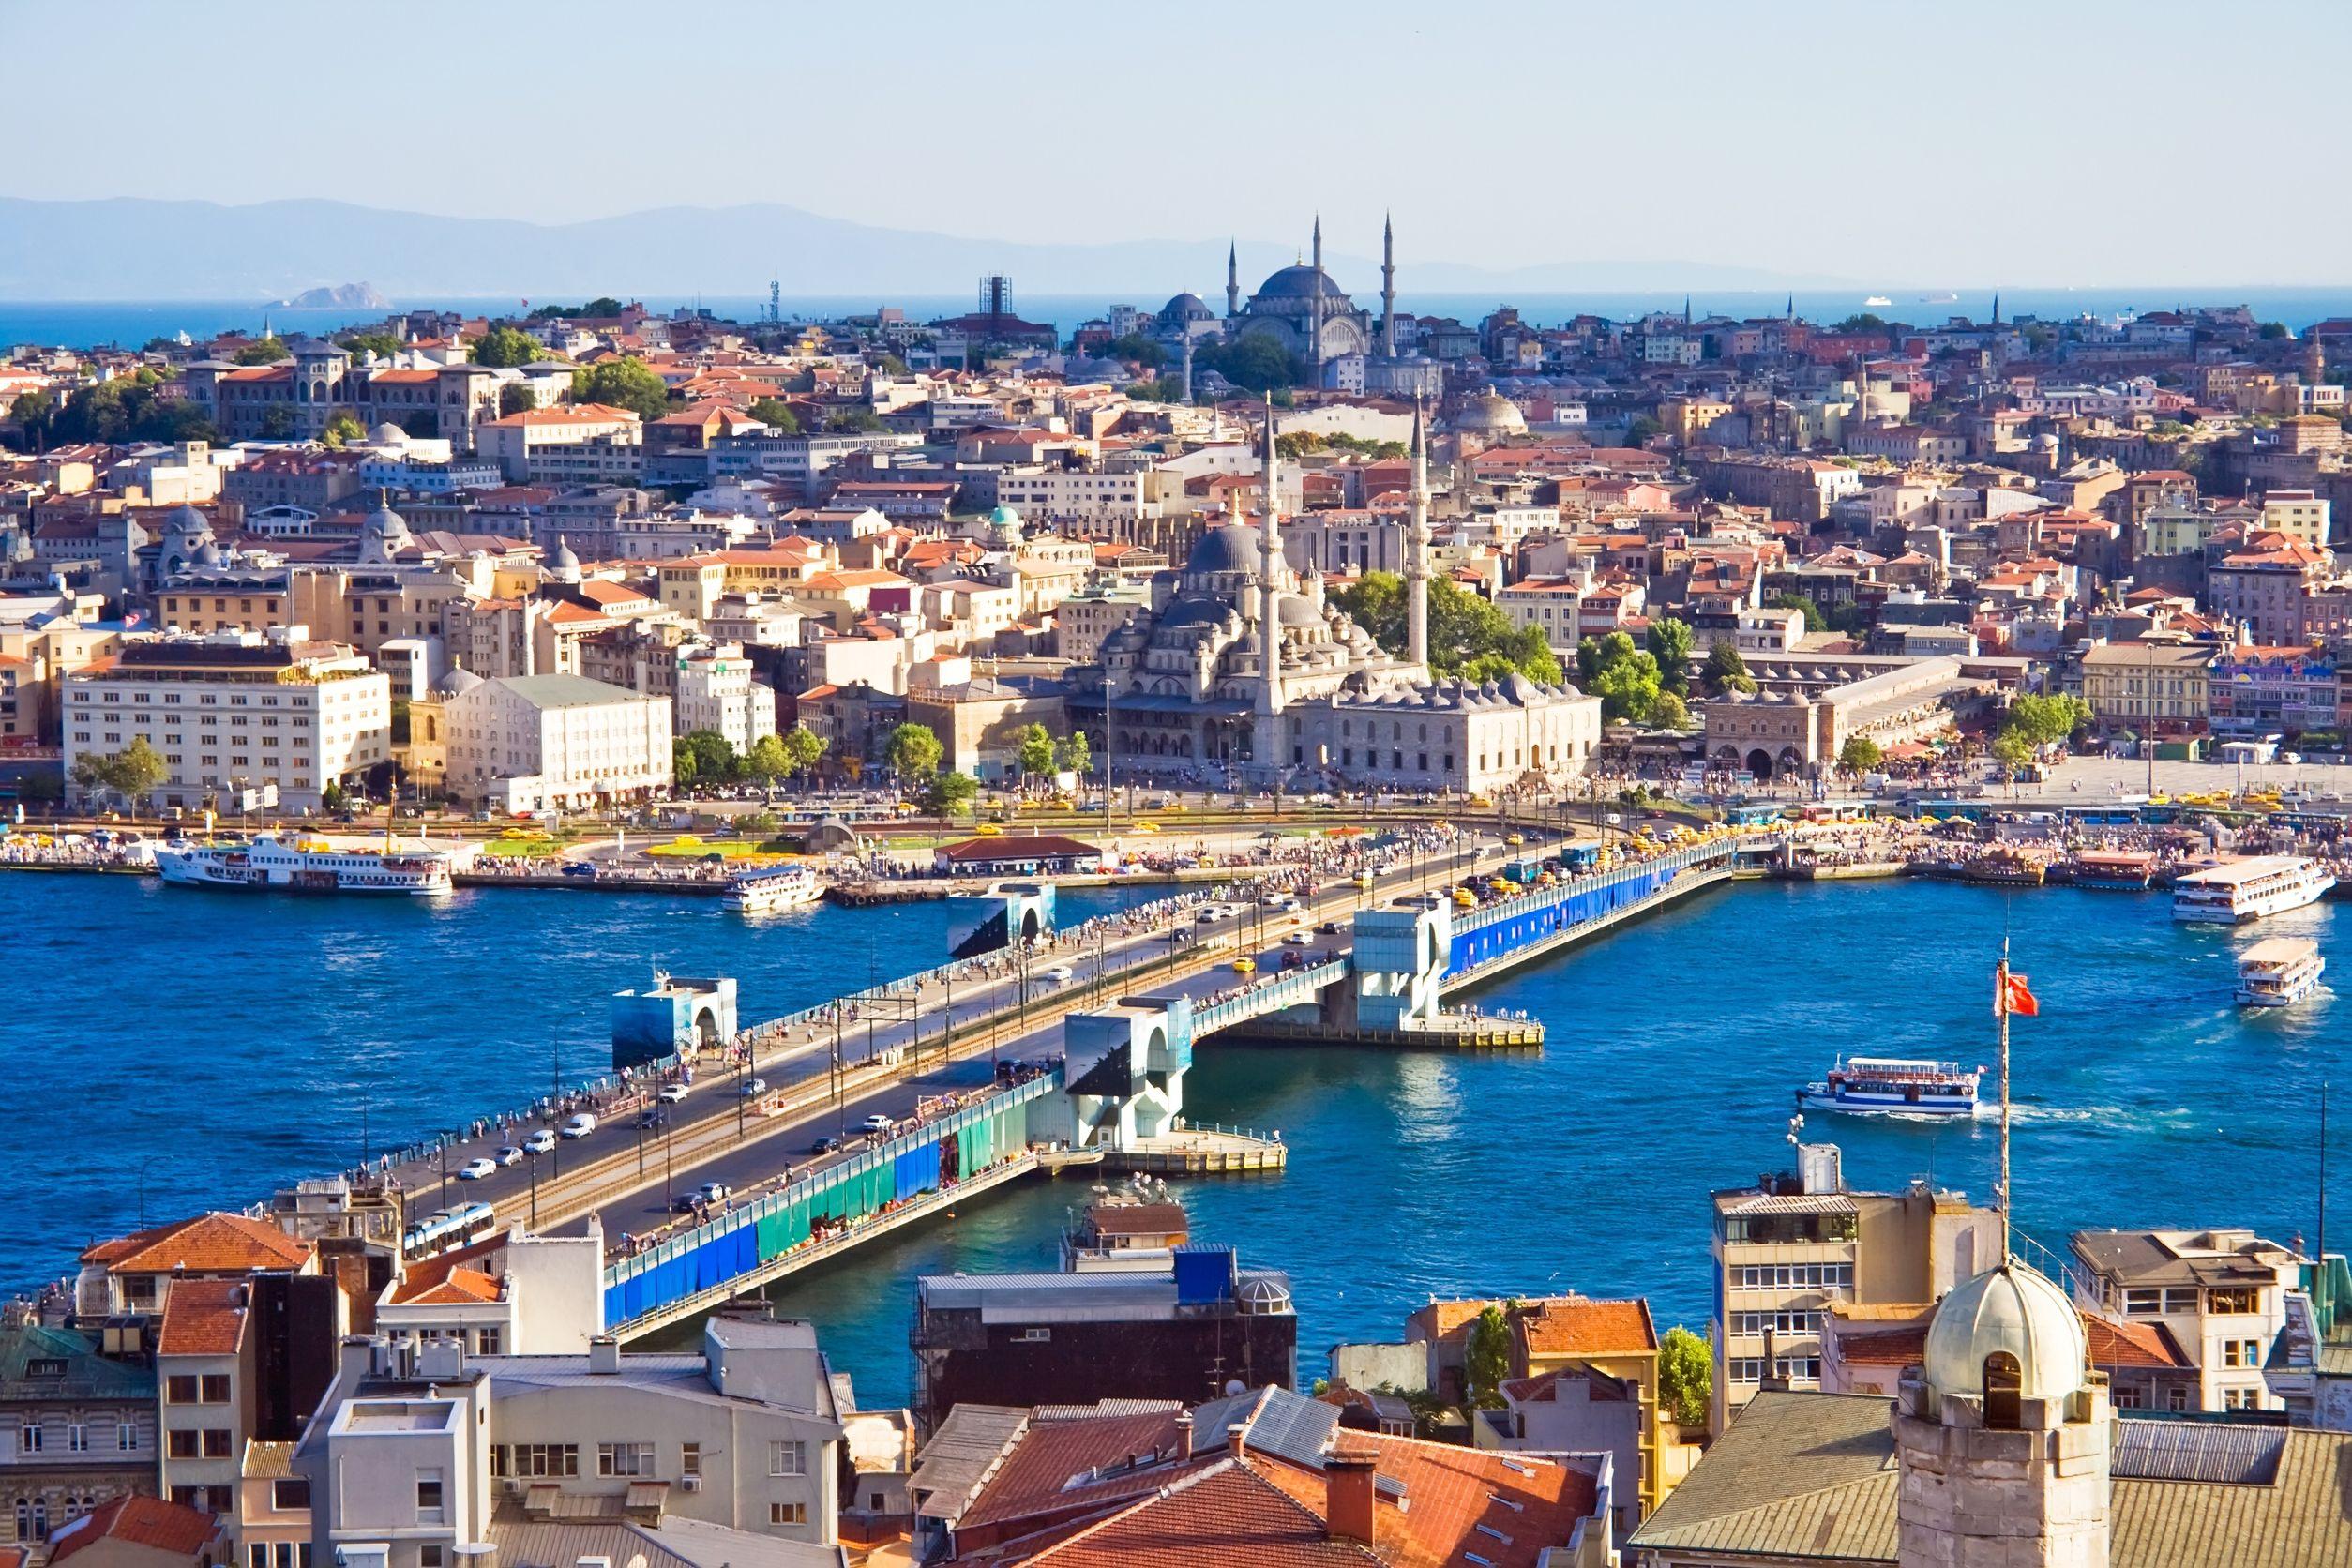 إسطنبول تركيا